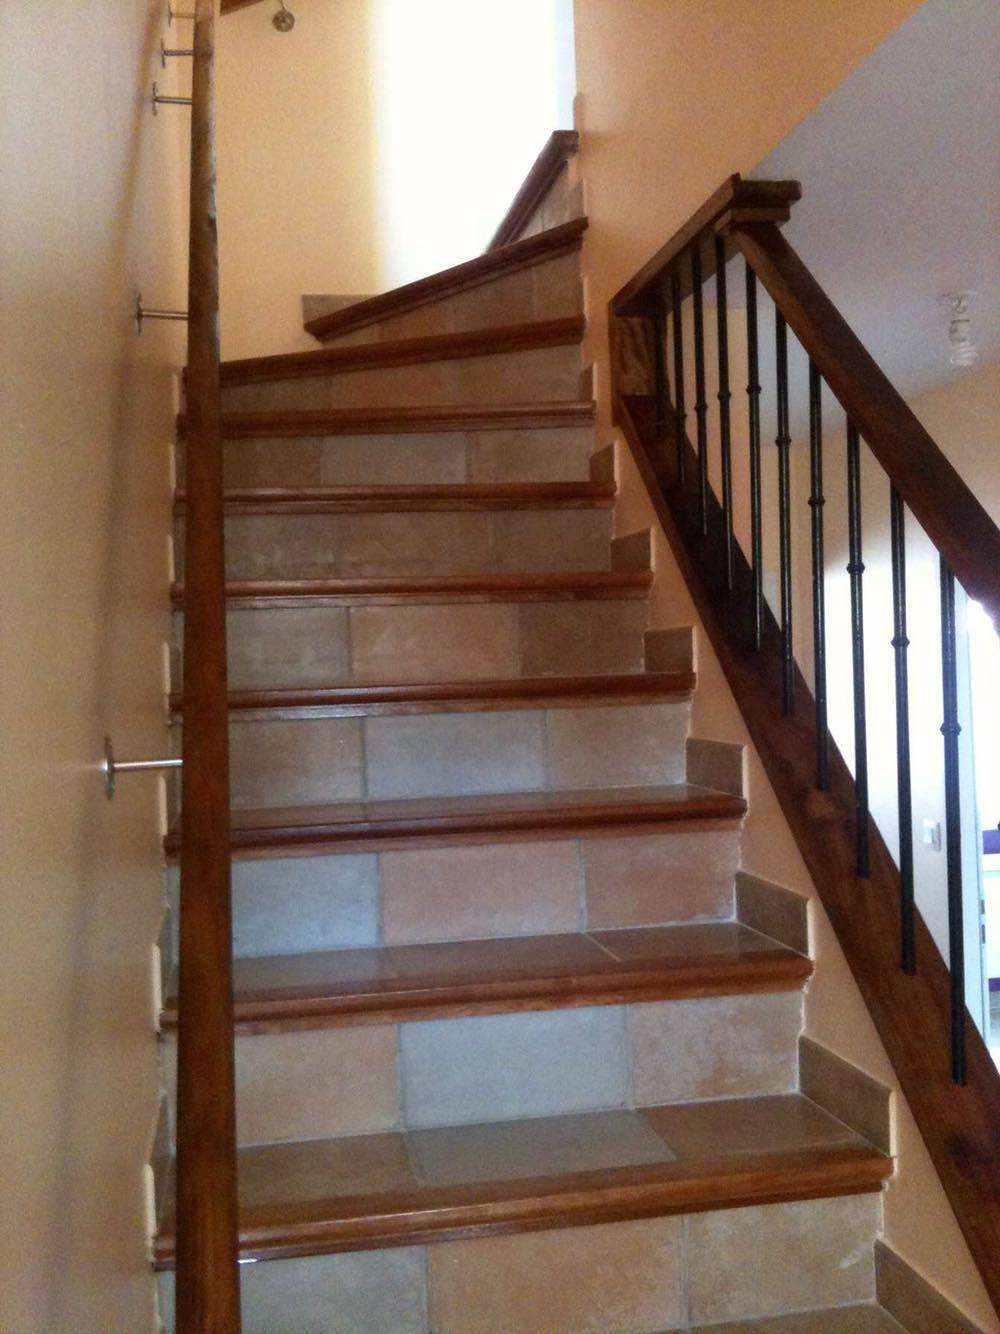 fabrication et pose d 39 escalier en b ton carrel. Black Bedroom Furniture Sets. Home Design Ideas